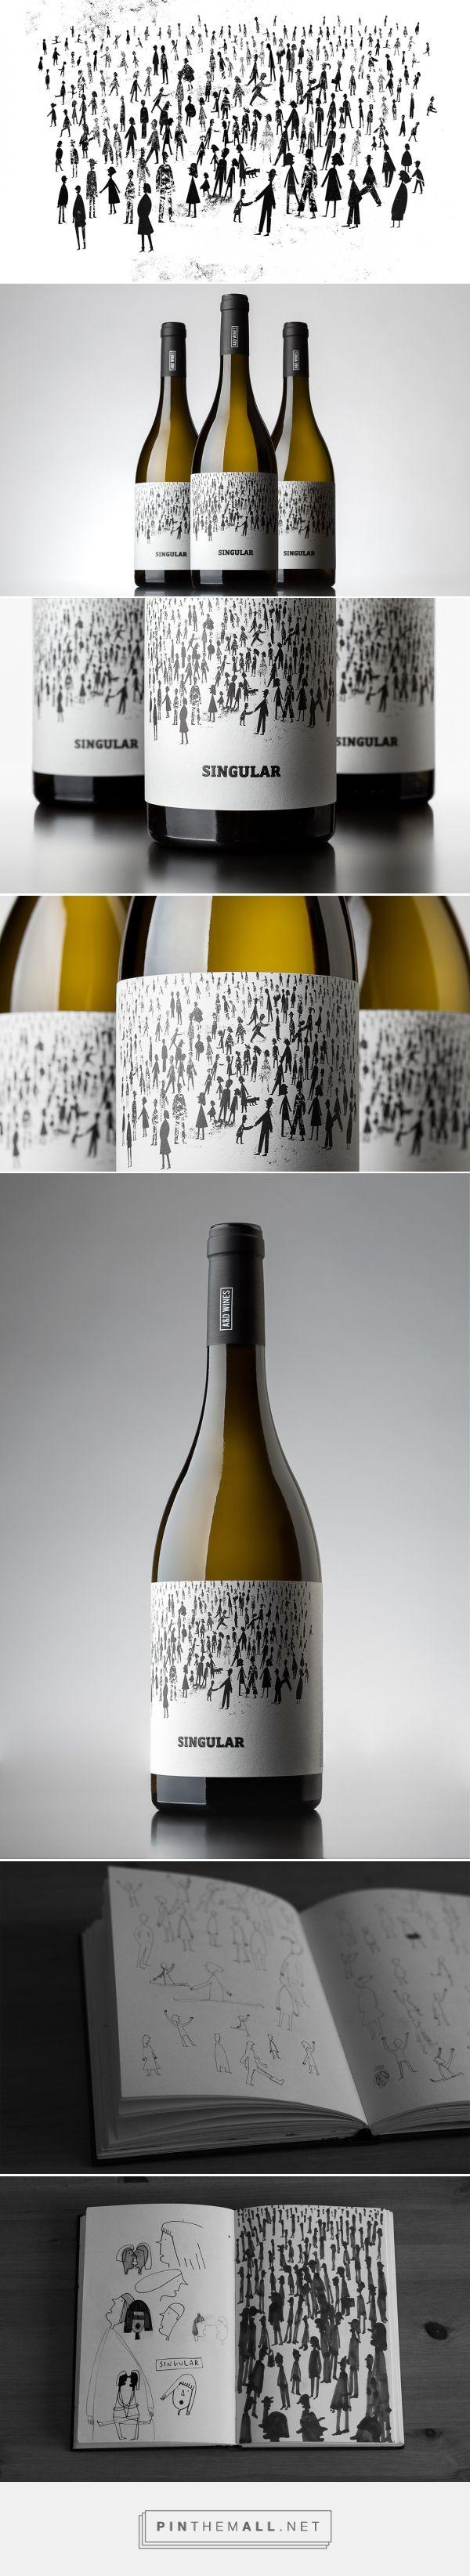 Singular Wine label design by Mariana Rio (Portugal) - http://www.packagingoftheworld.com/2016/08/singular-wine.html